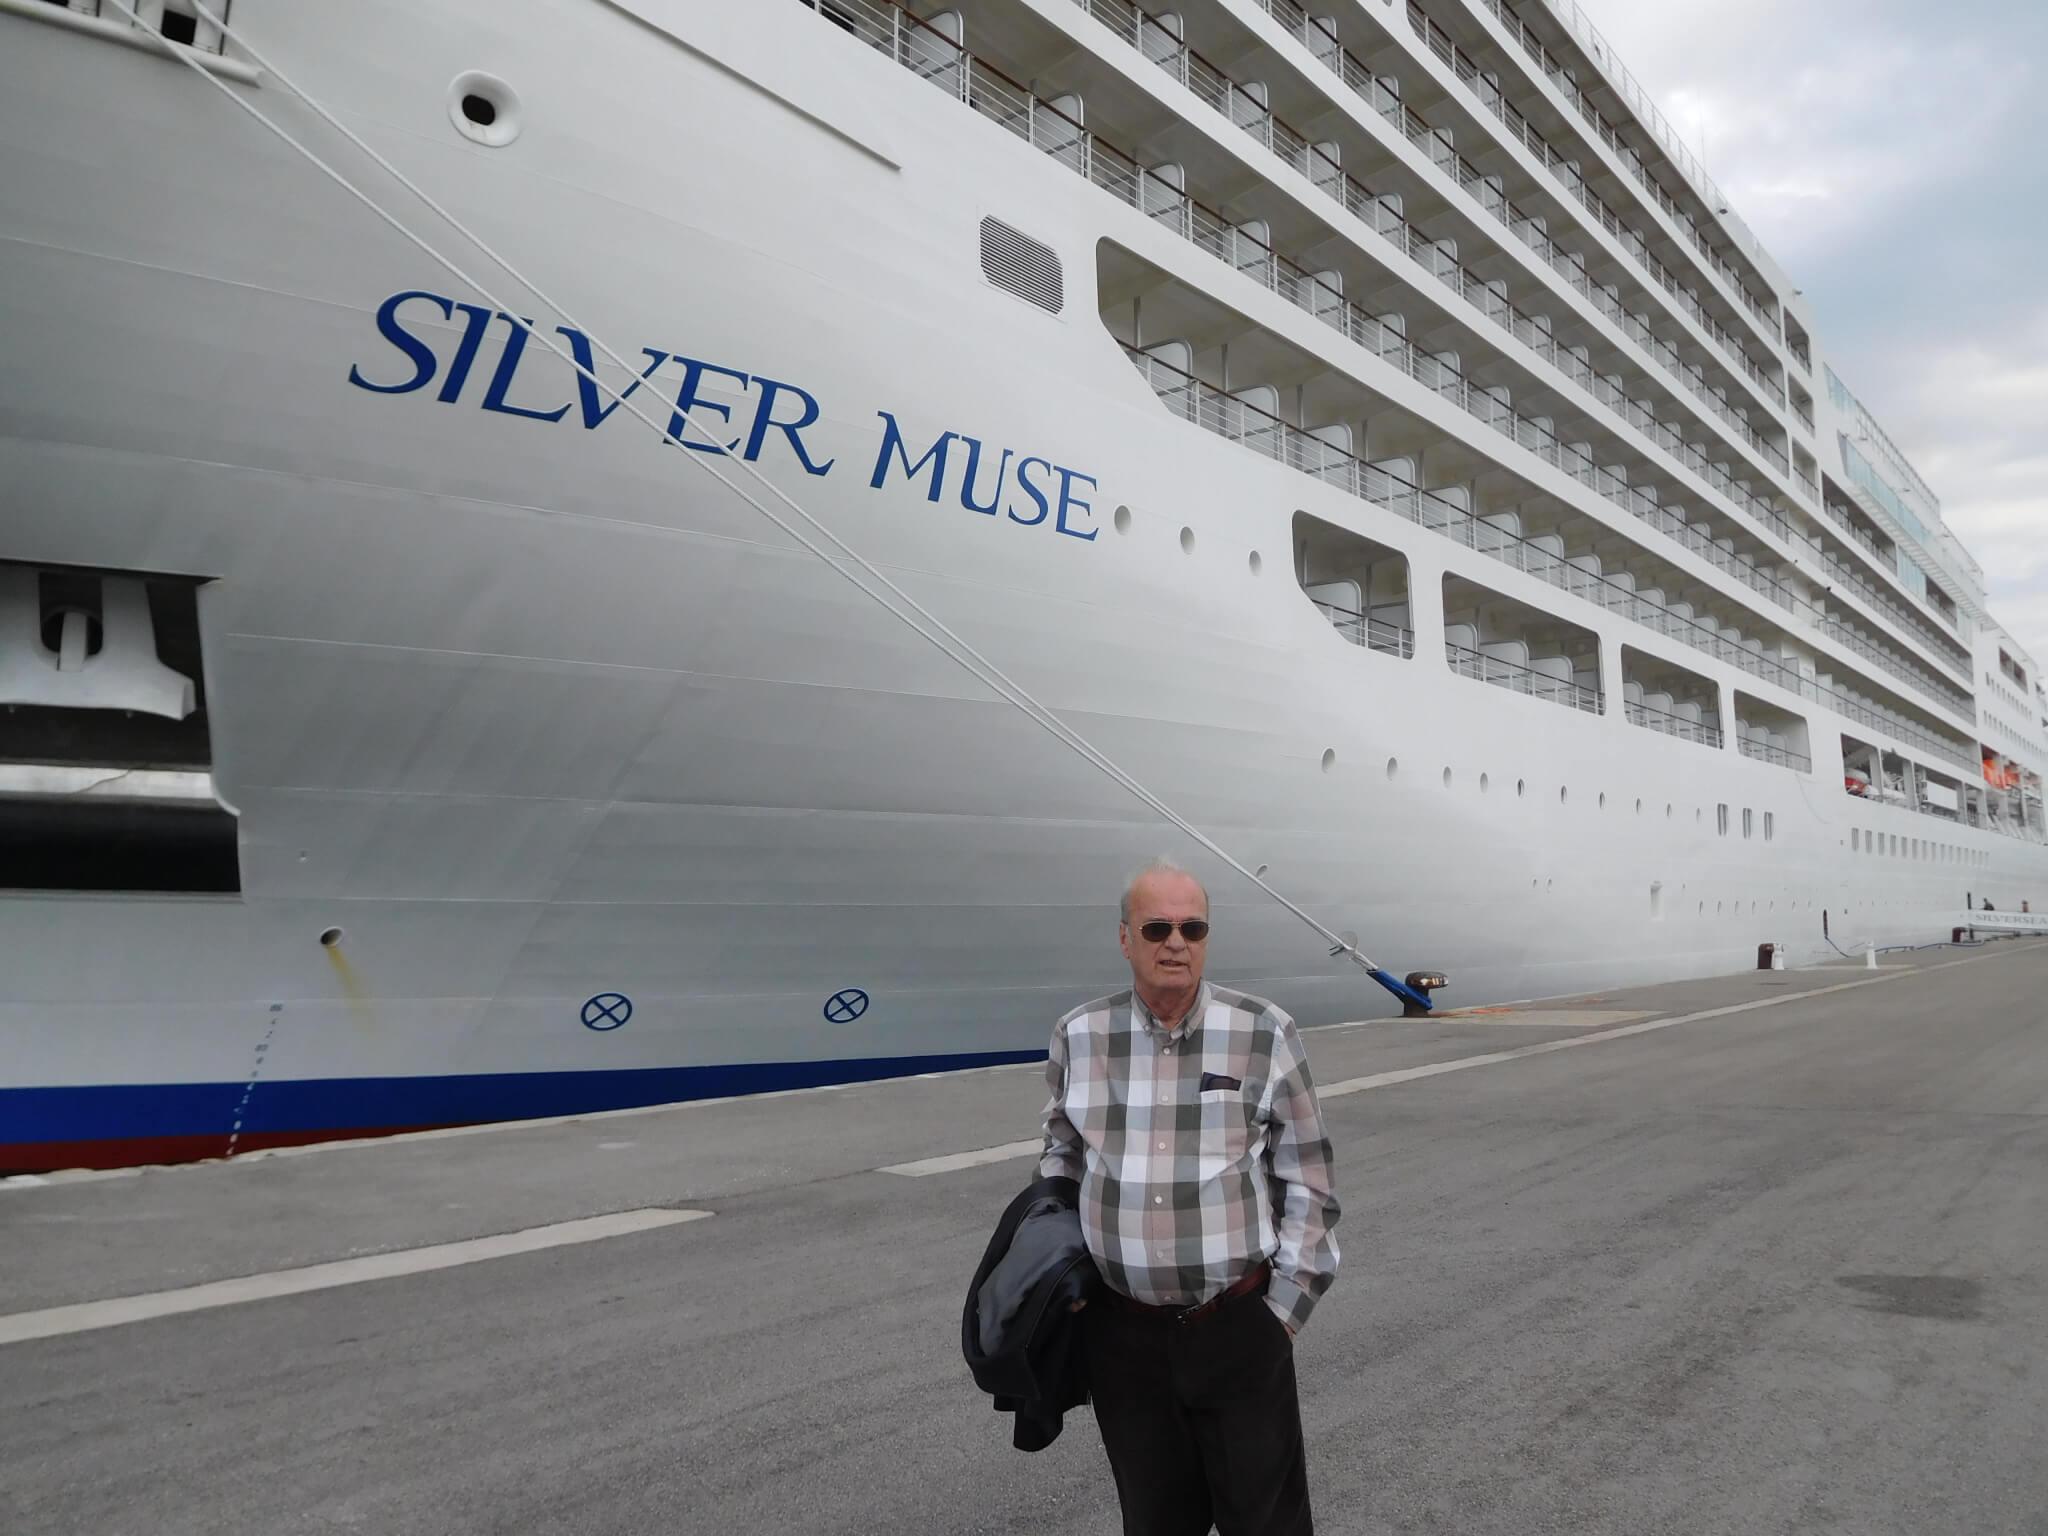 Silversea Muse